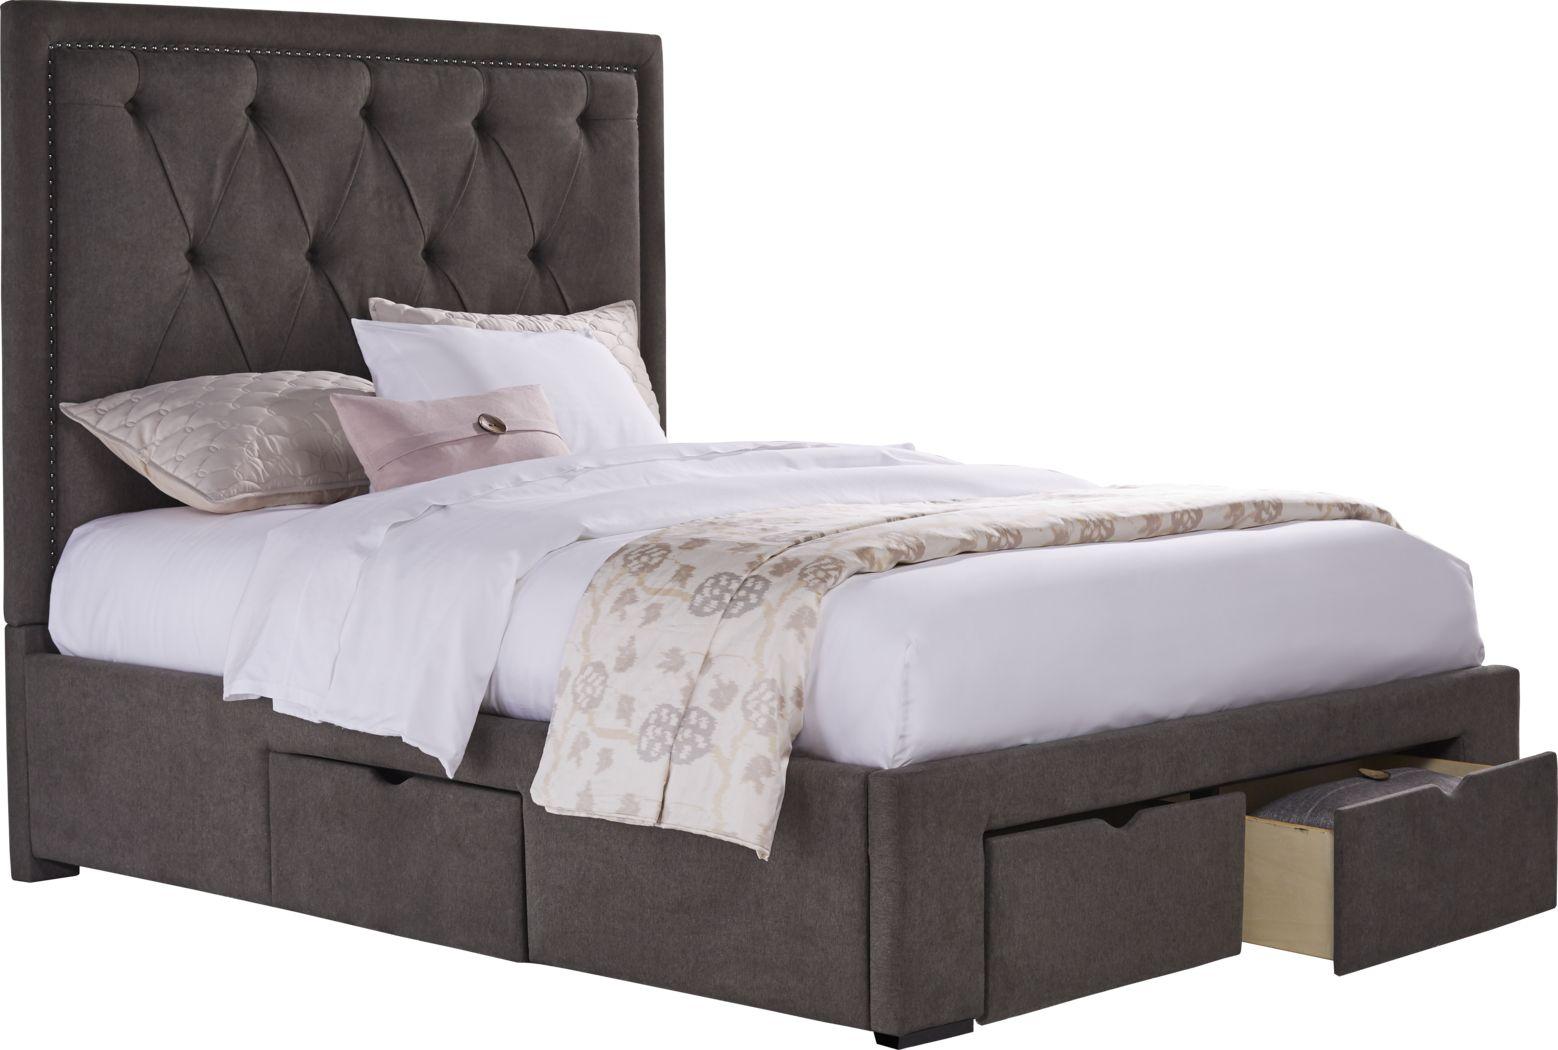 Elridge Granite 3 Pc King Upholstered Bed with 4 Drawer Storage